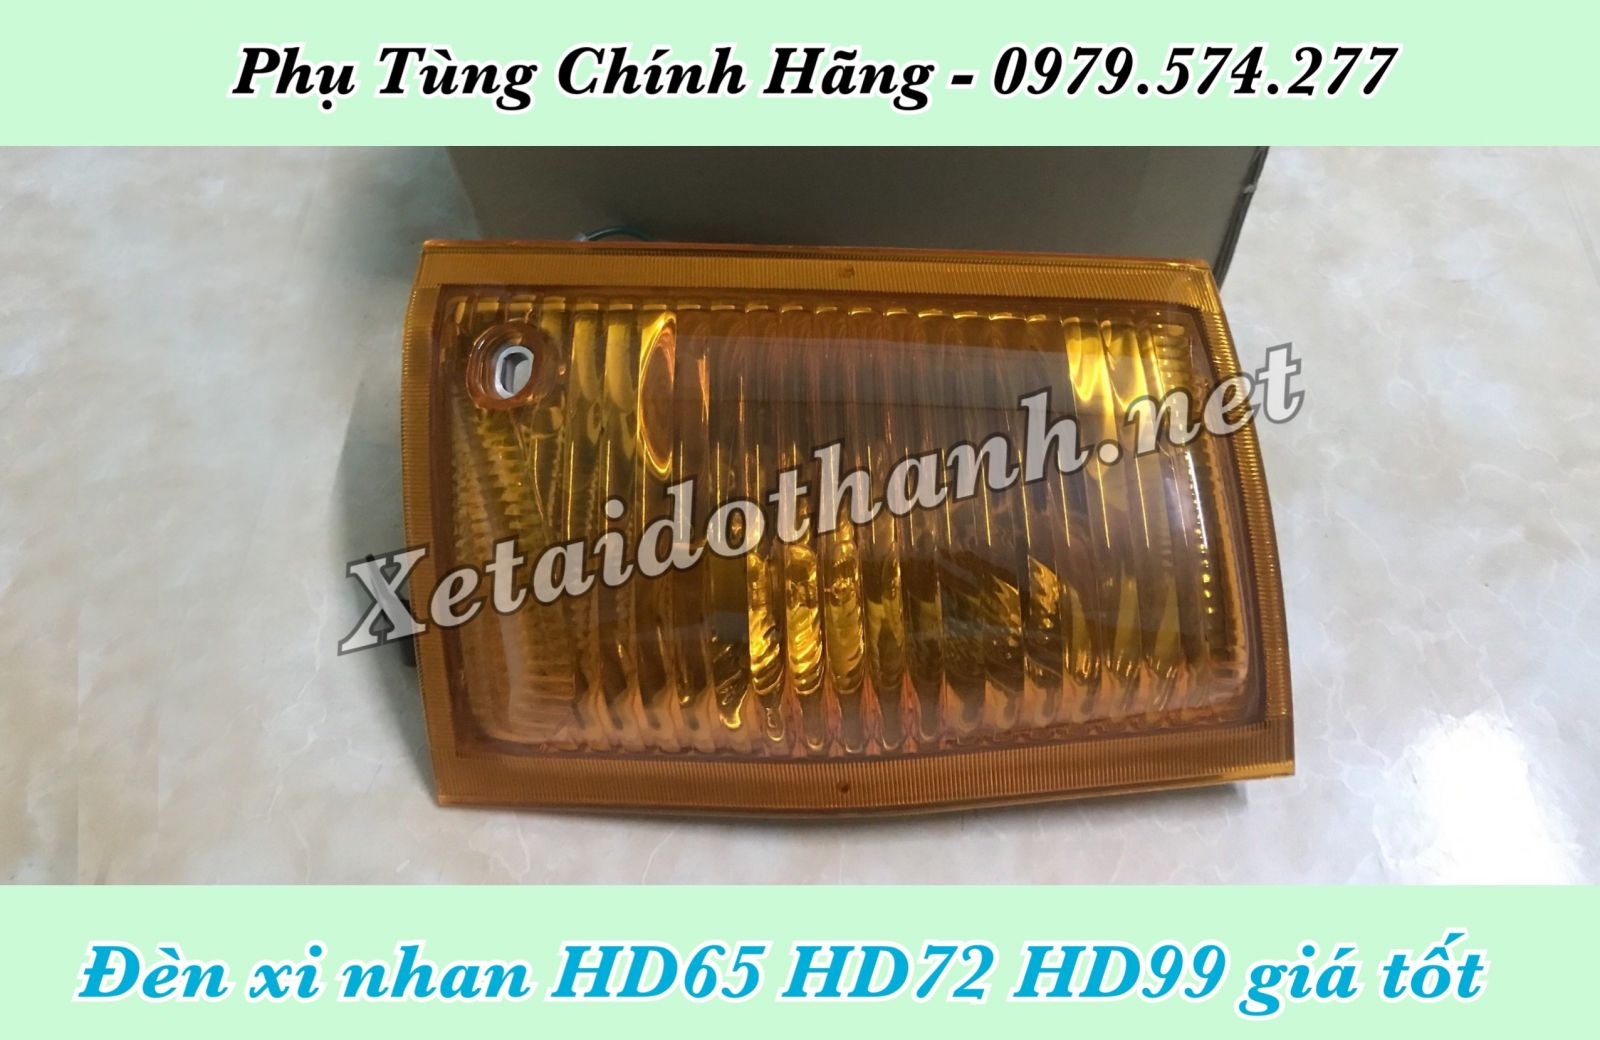 DEN XI NHAN HD120SL